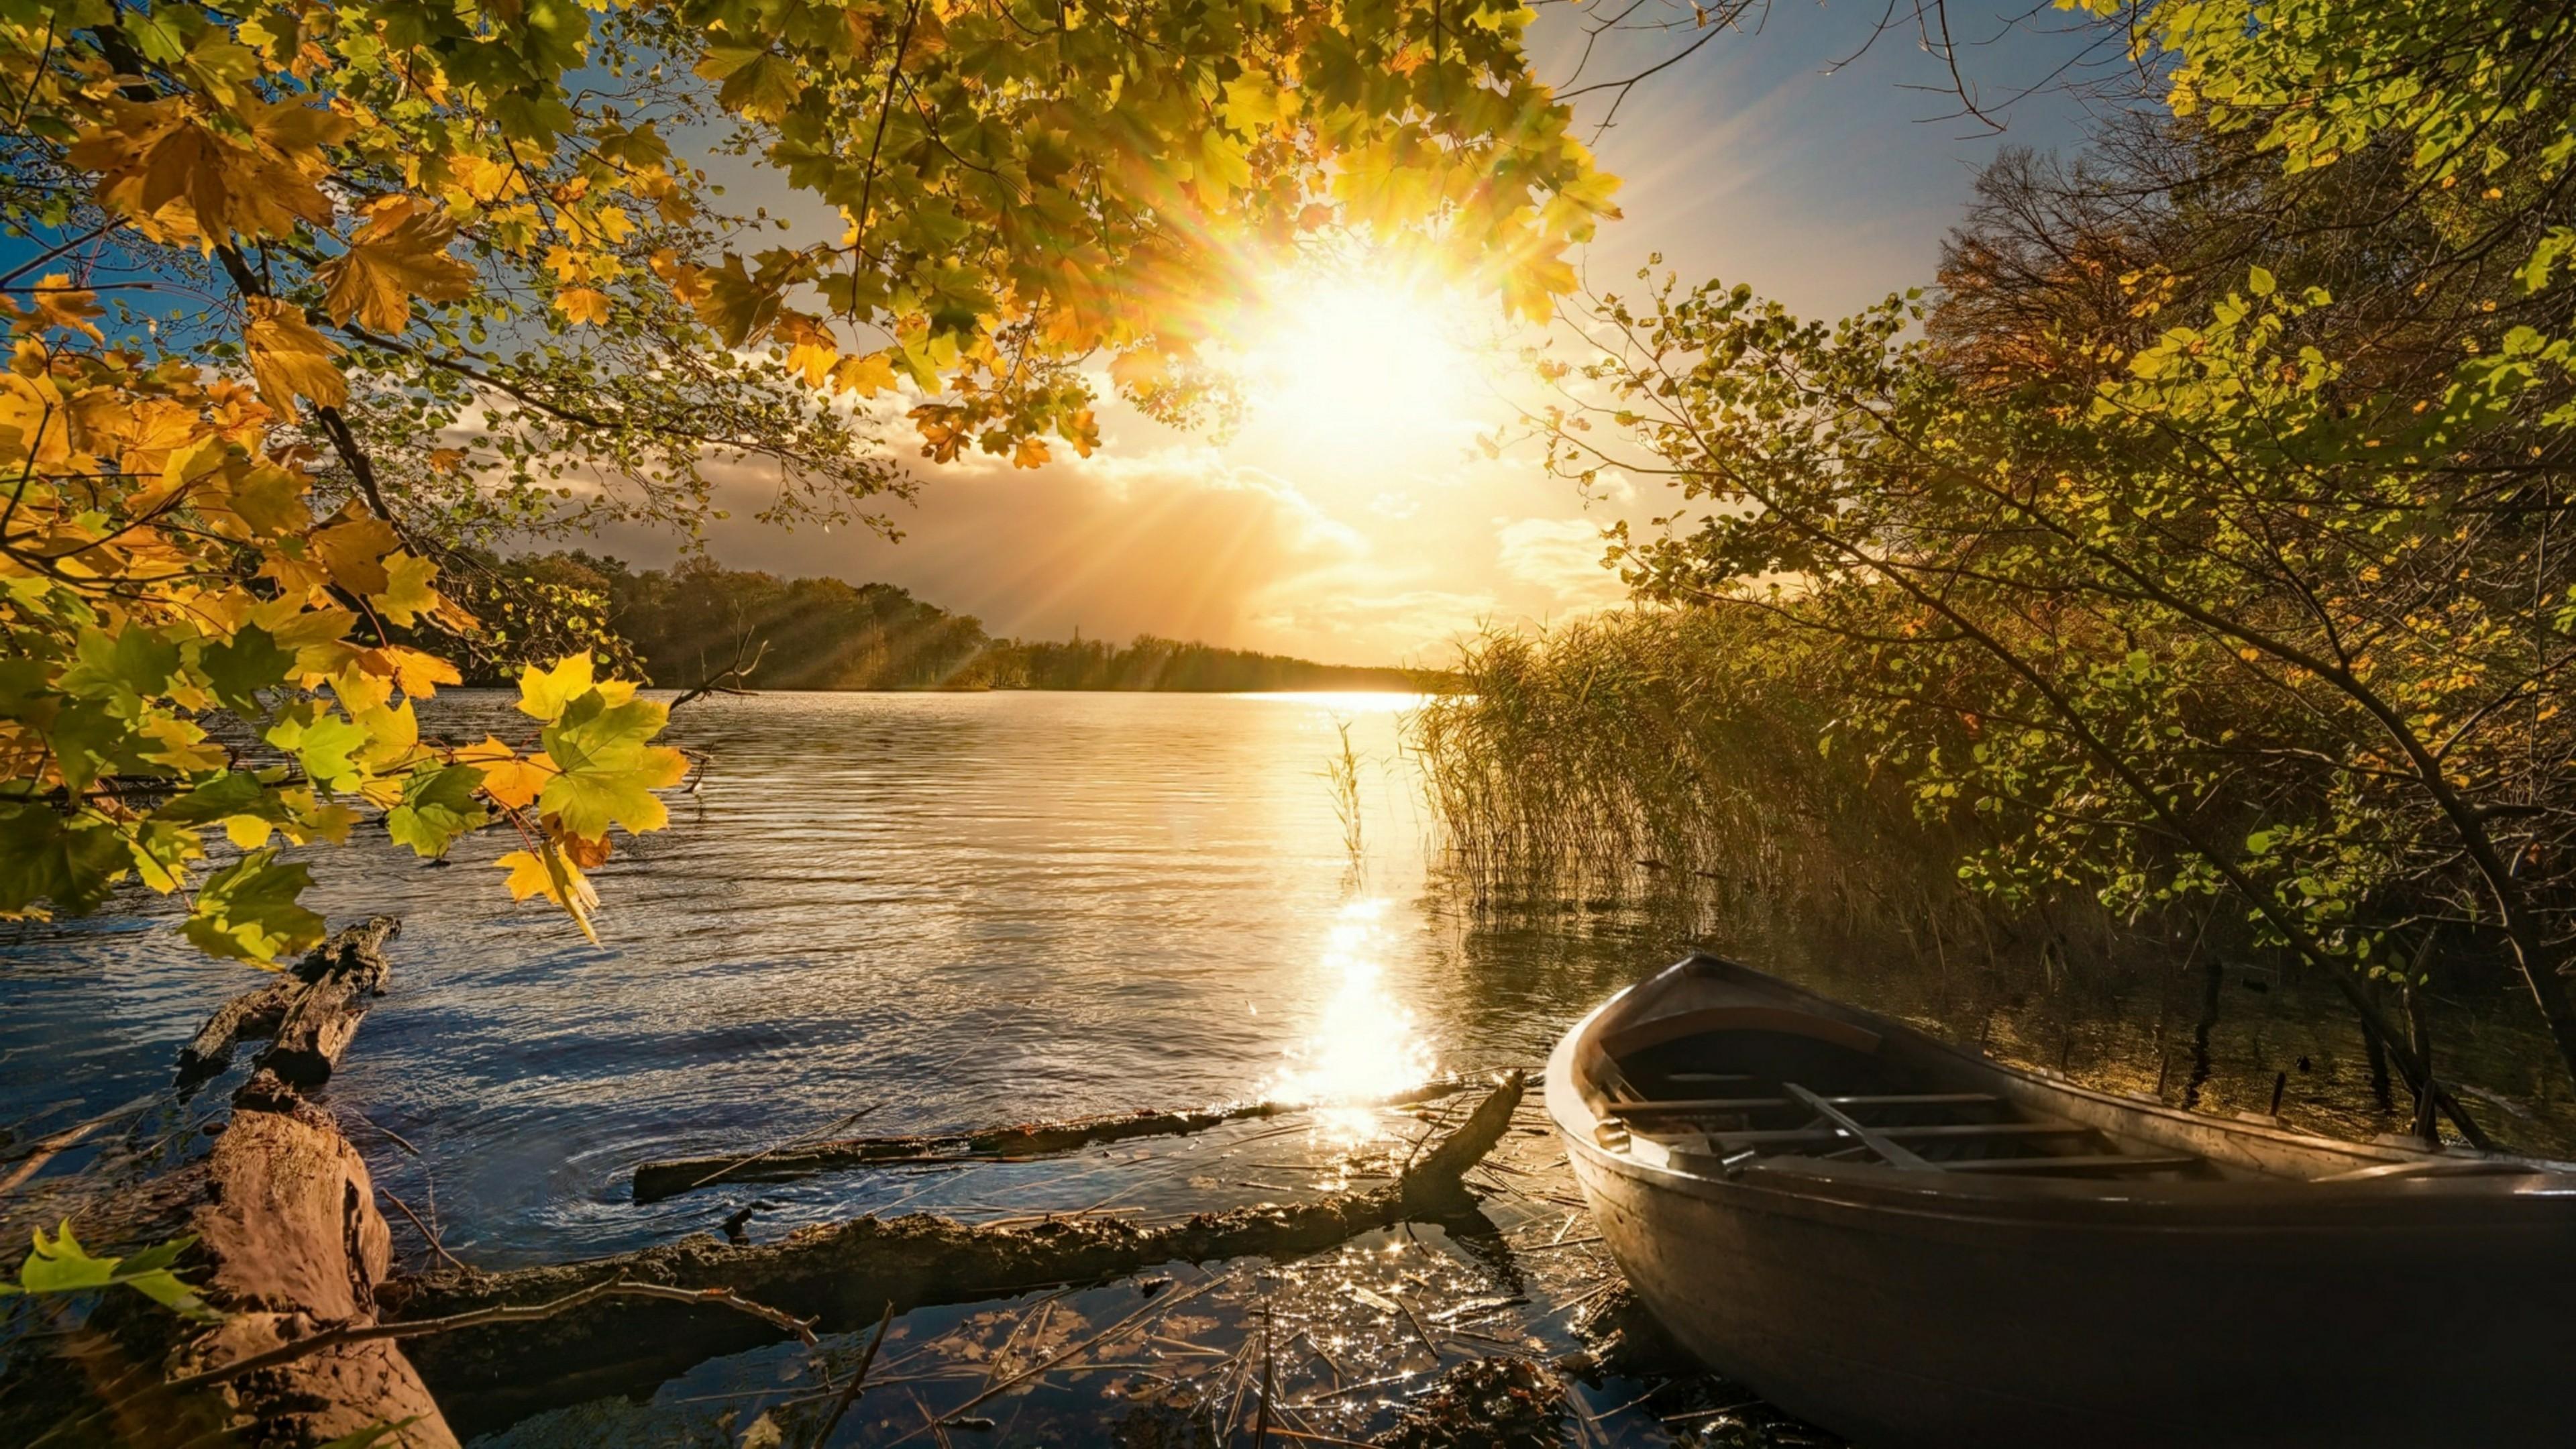 Autumn Sunshine 4K UltraHD Wallpaper